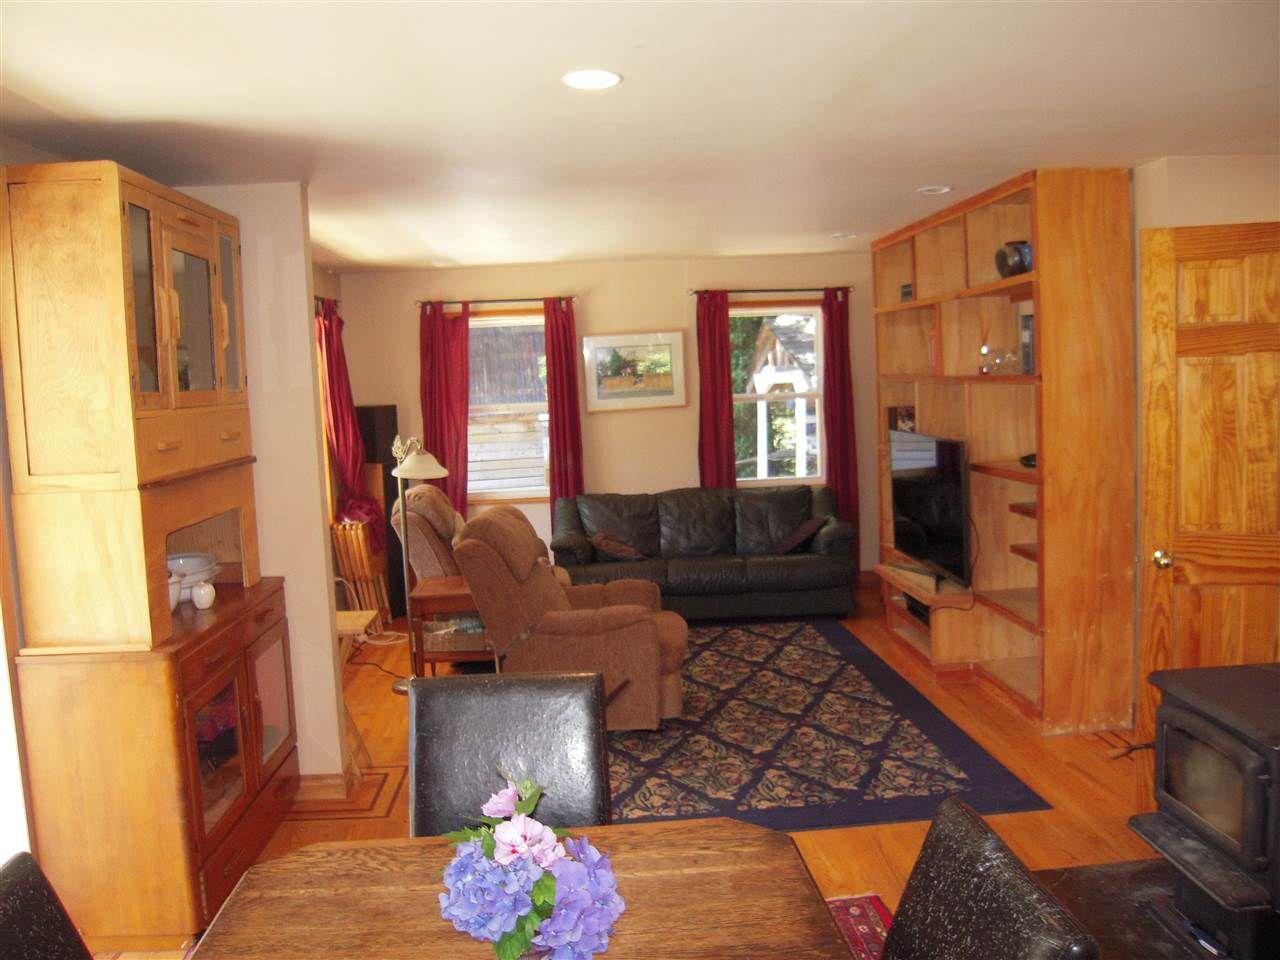 Photo 9: Photos: 2670 LOWER Road: Roberts Creek House for sale (Sunshine Coast)  : MLS®# R2096275